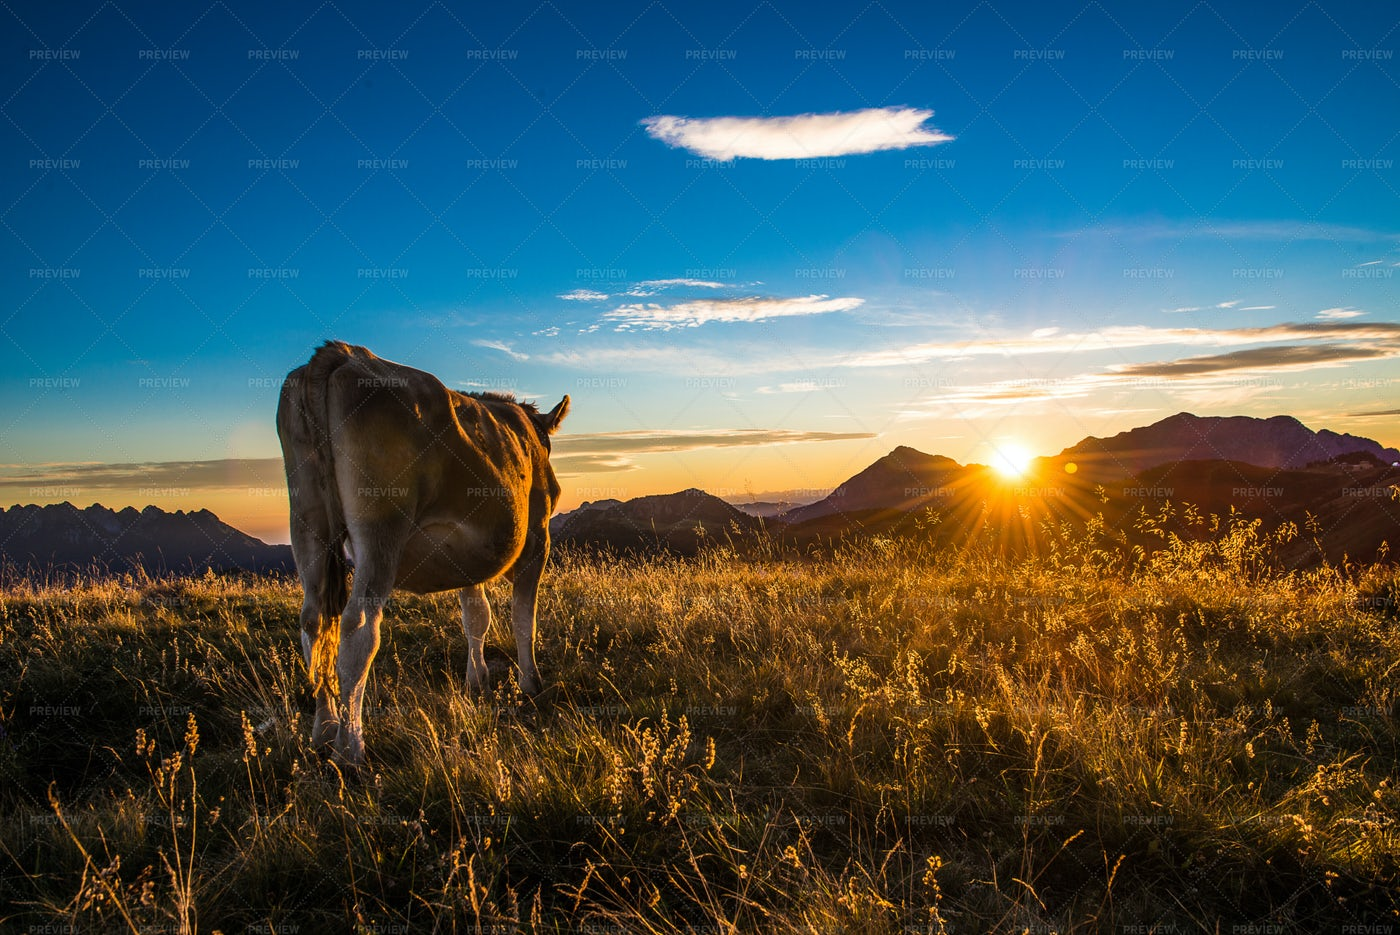 Grazing Cow At Sunset: Stock Photos